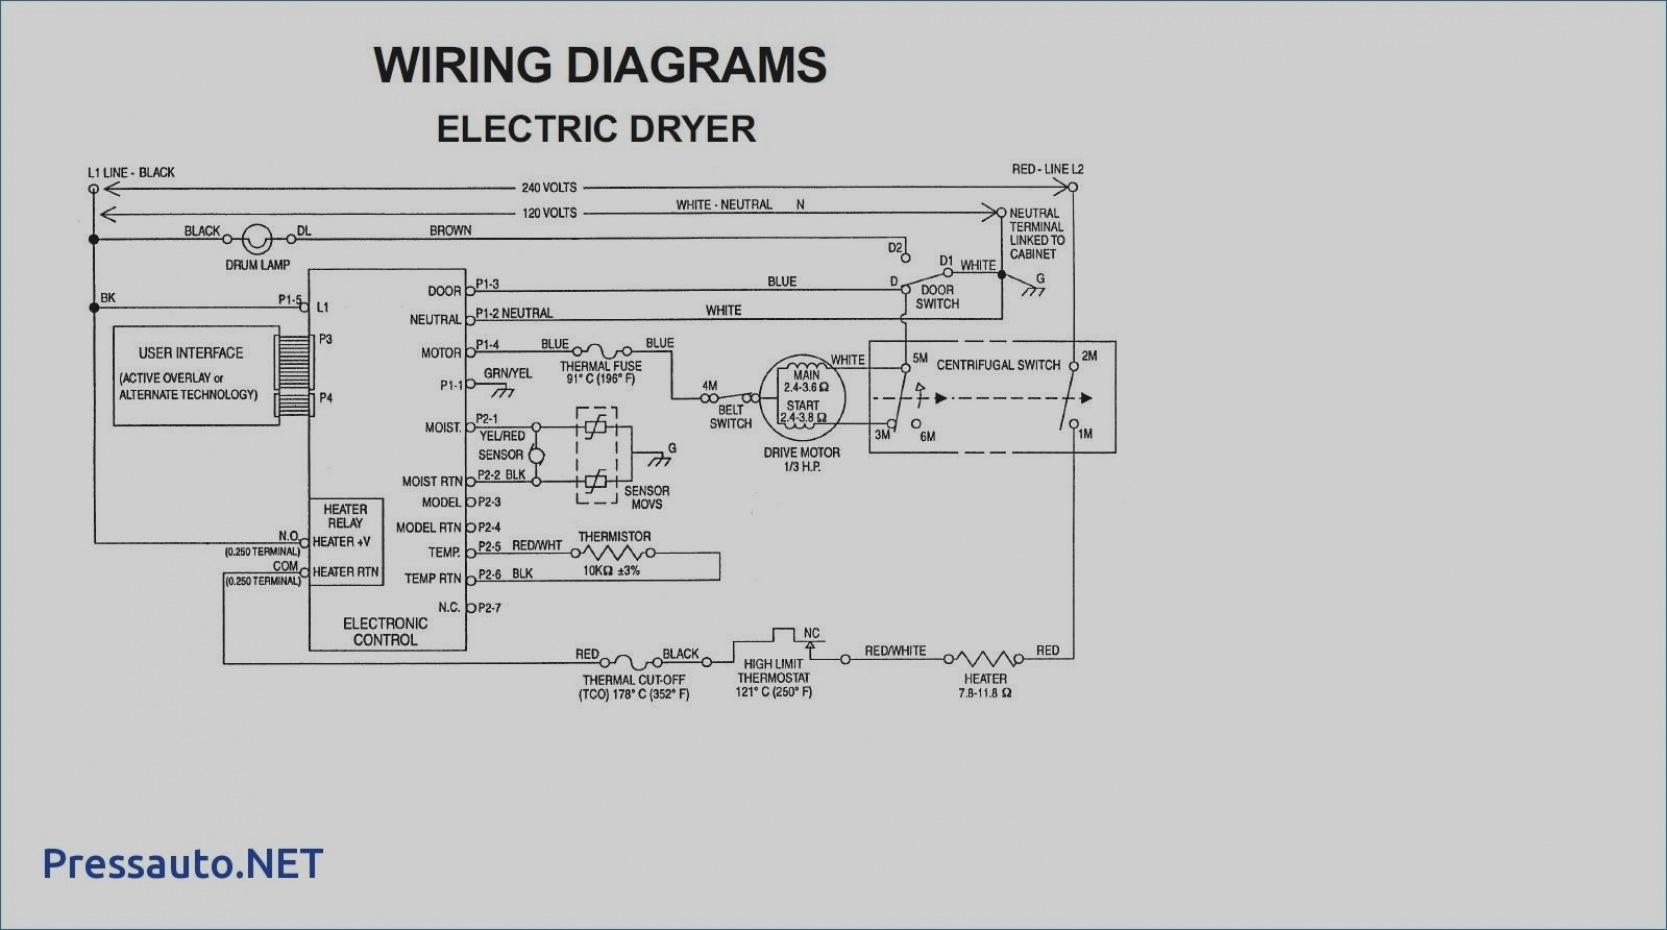 whirlpool sport duet dryer wiring diagram    whirlpool       dryer       wiring       diagram    free    wiring       diagram        whirlpool       dryer       wiring       diagram    free    wiring       diagram